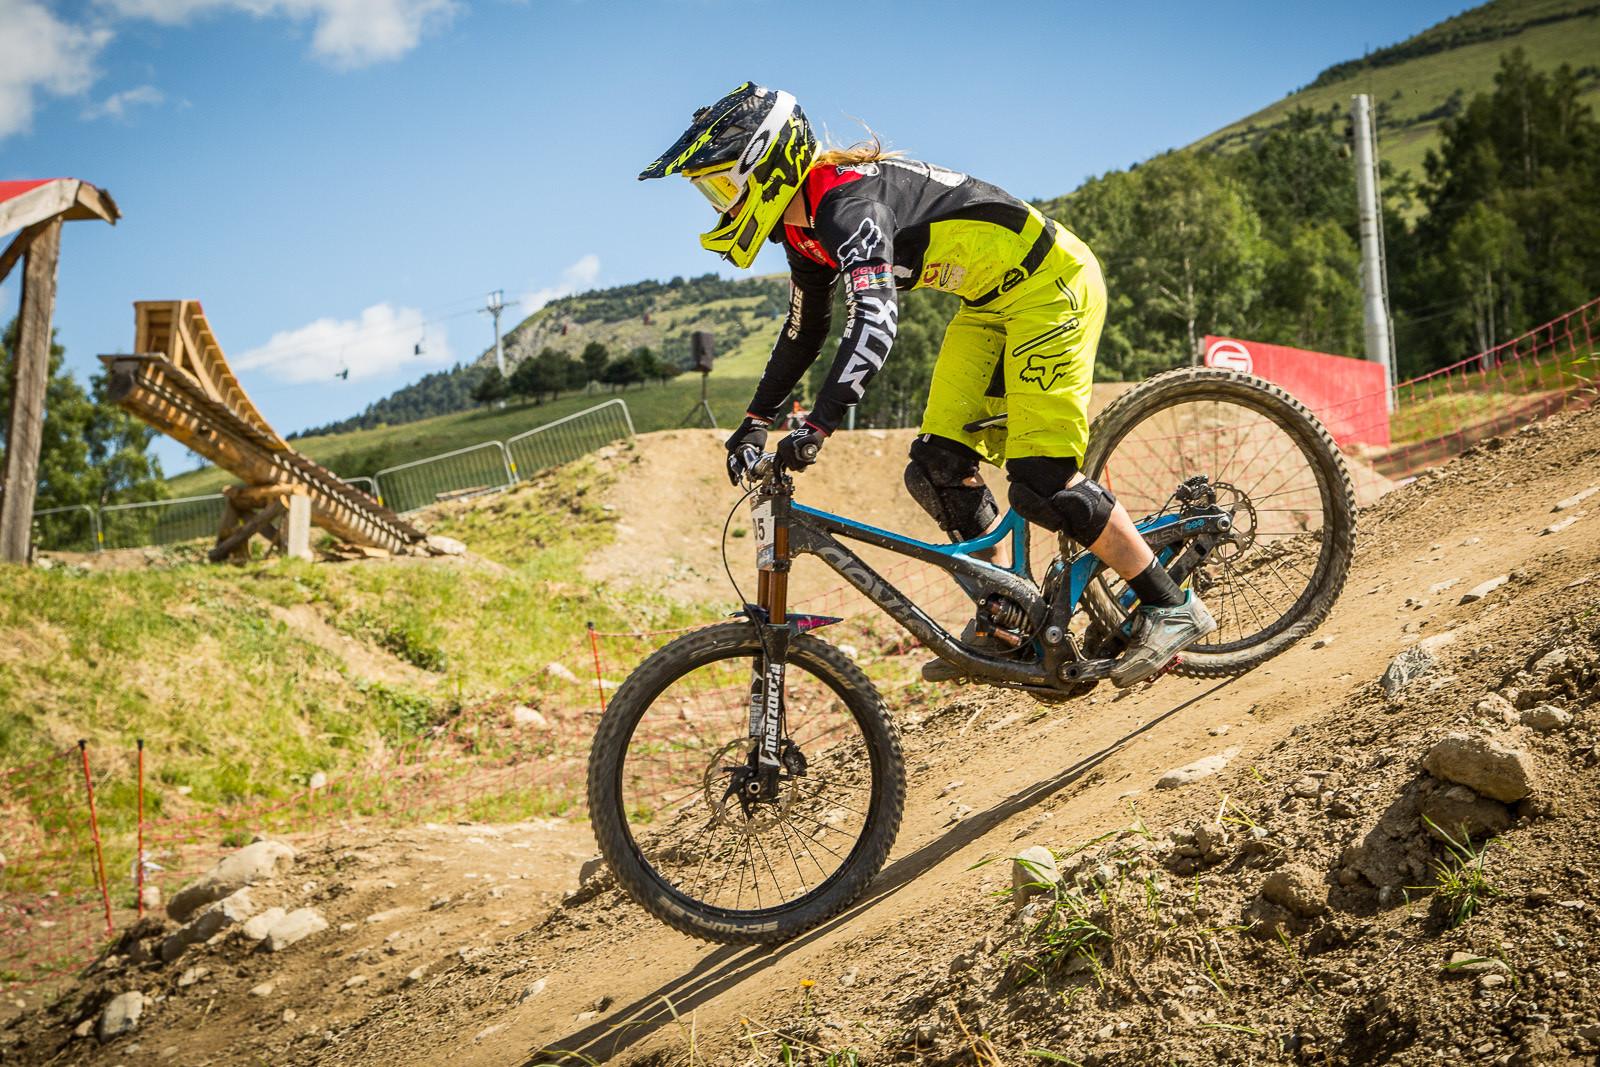 Devinci Wilson G-Out - G-Out Project: Crankworx L2A Air DH - Mountain Biking Pictures - Vital MTB